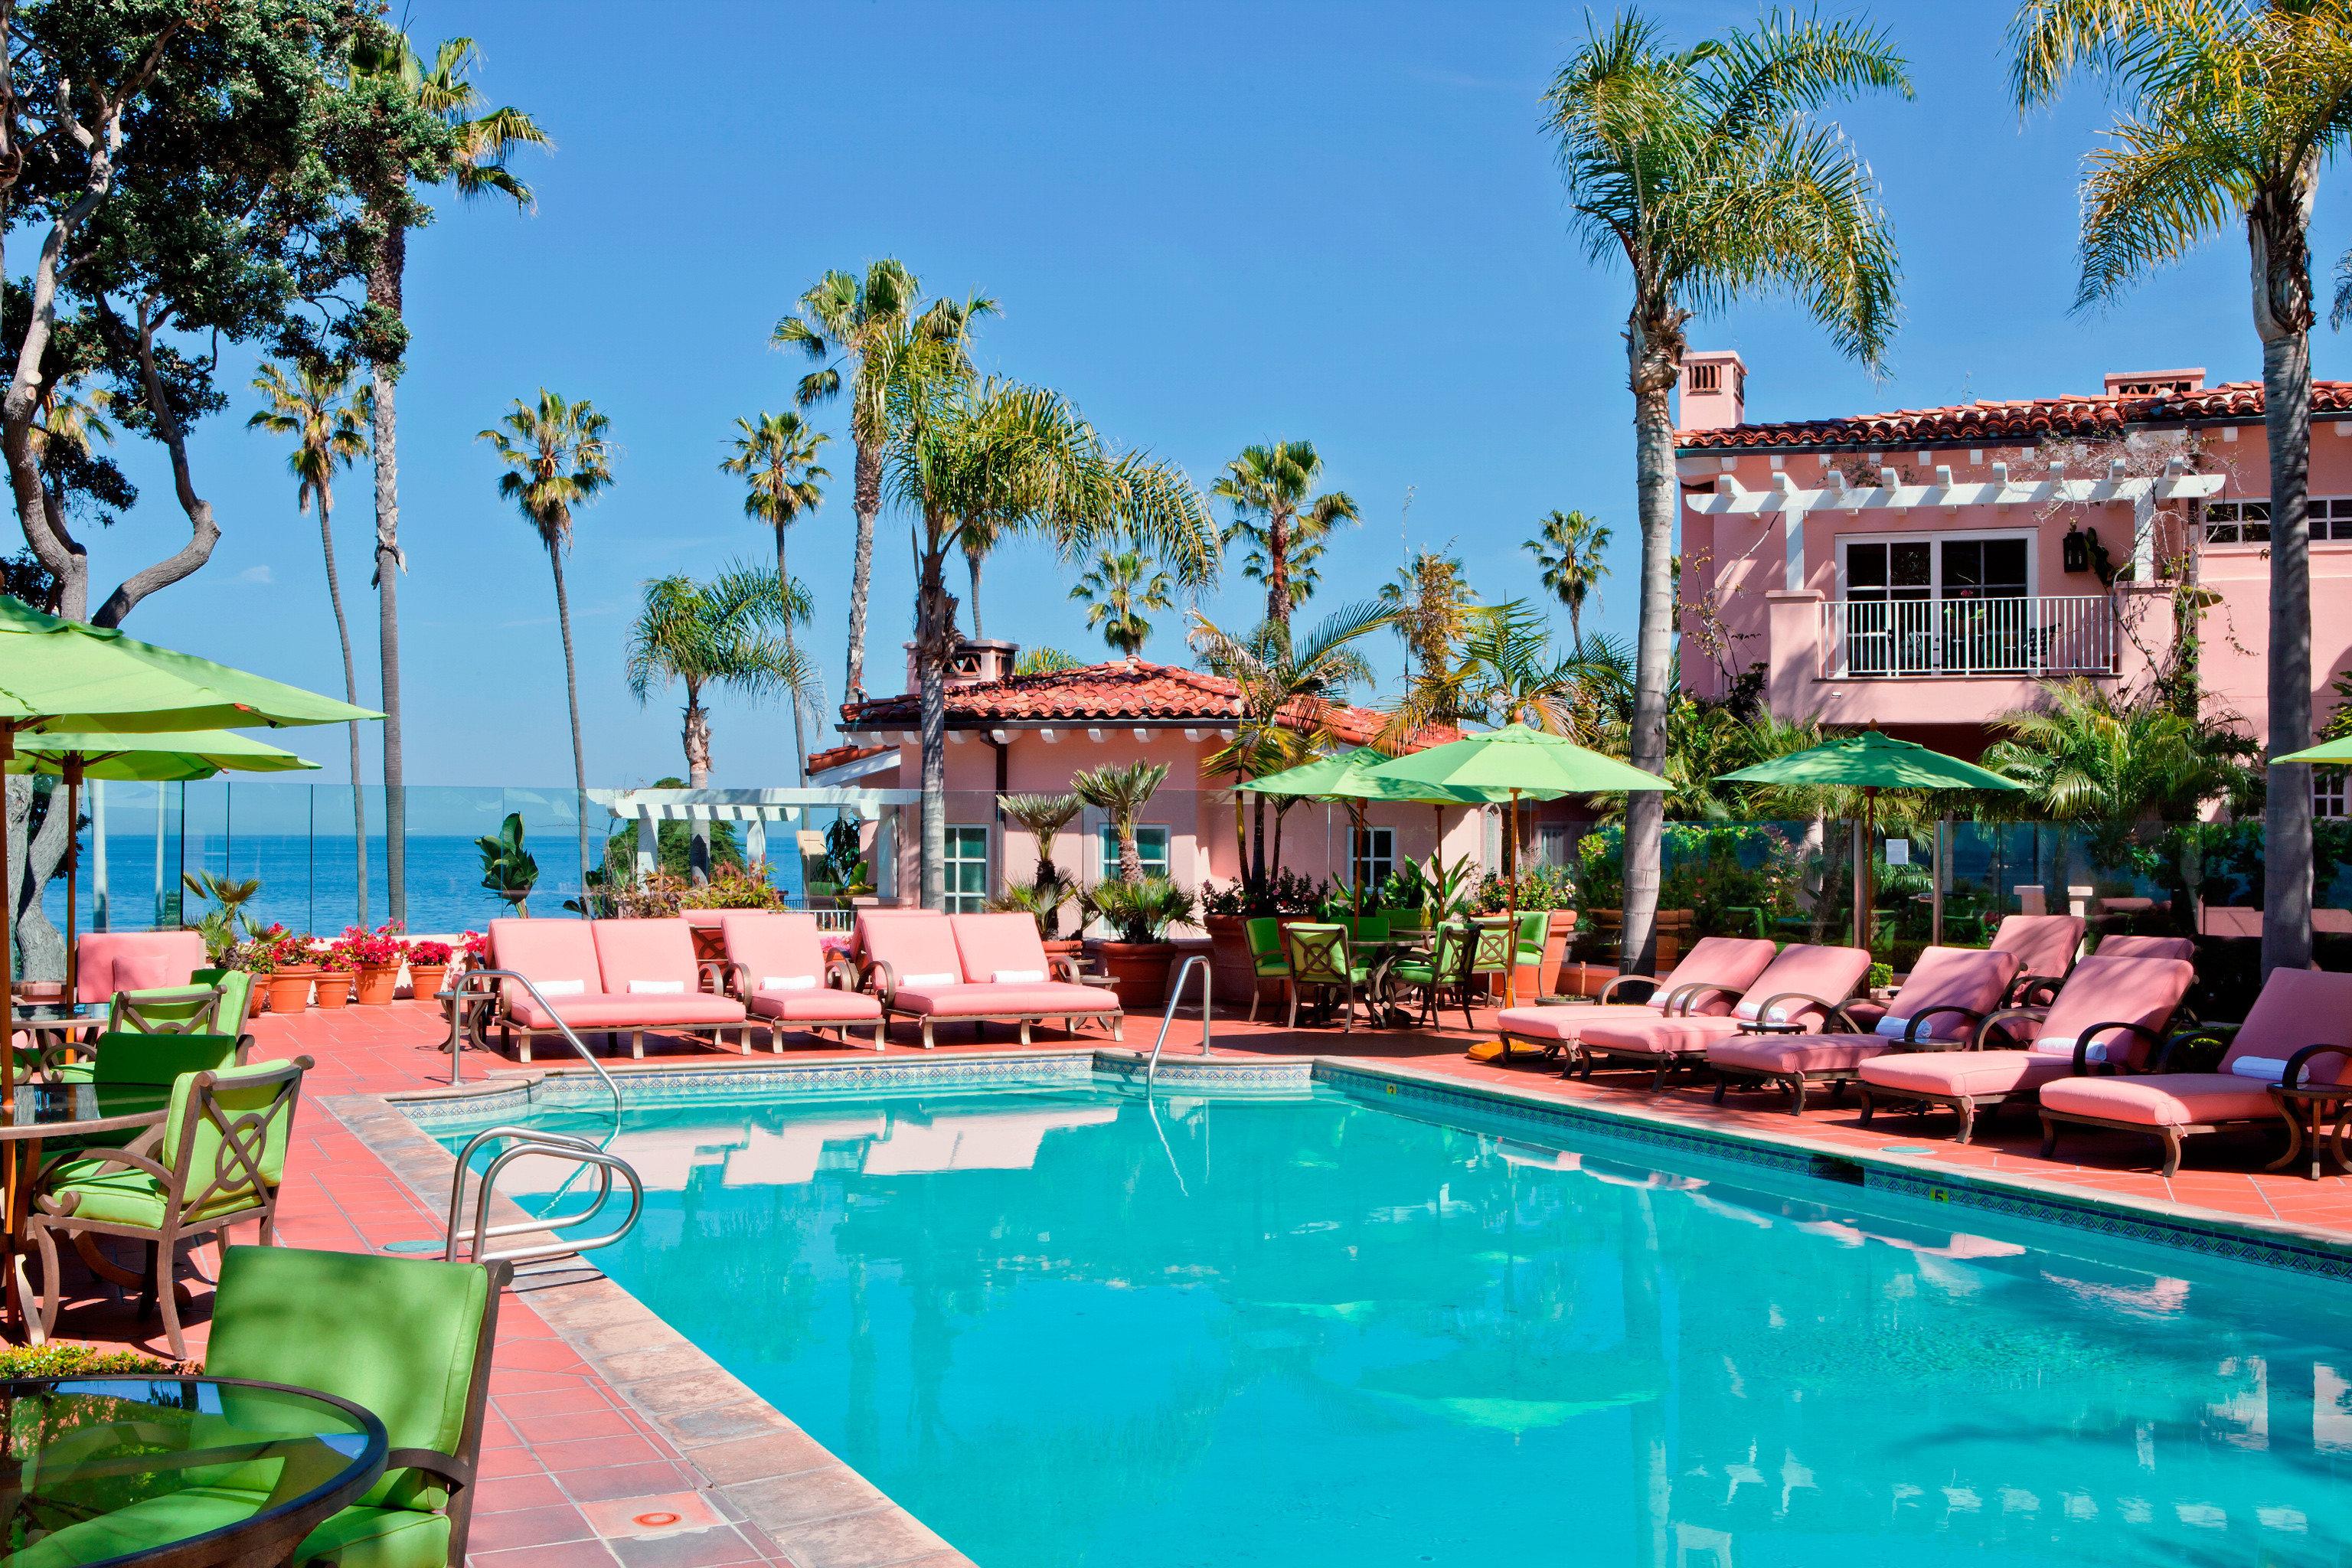 Elegant Hotels Luxury Patio Pool Trip Ideas Tropical tree sky swimming pool leisure Resort property resort town Villa palace amusement park swimming